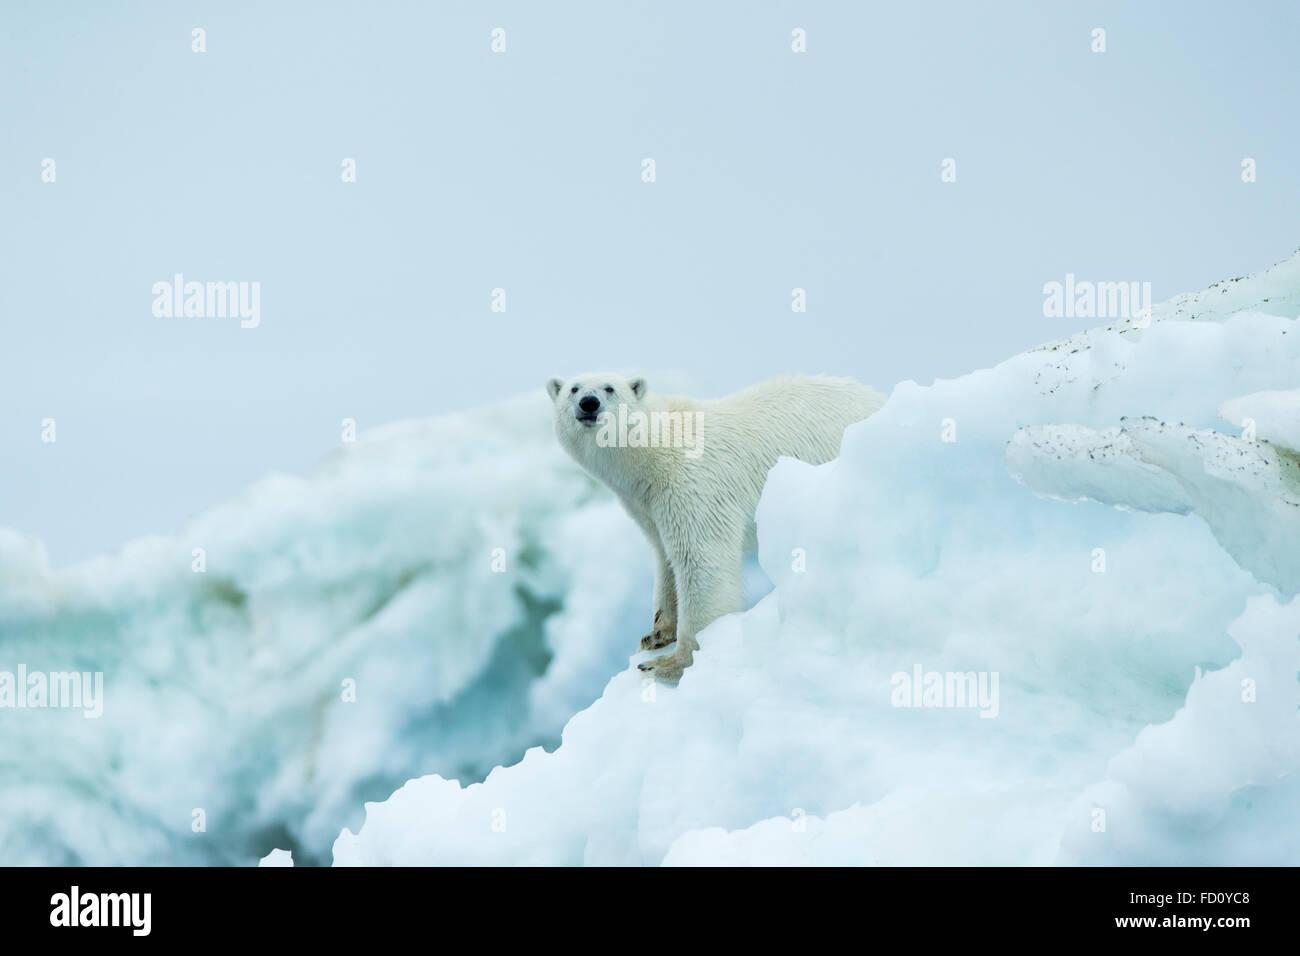 Canada, Nunavut Territory, Repulse Bay, Polar Bear (Ursus maritimus) standing amid melting sea ice near Harbour - Stock Image